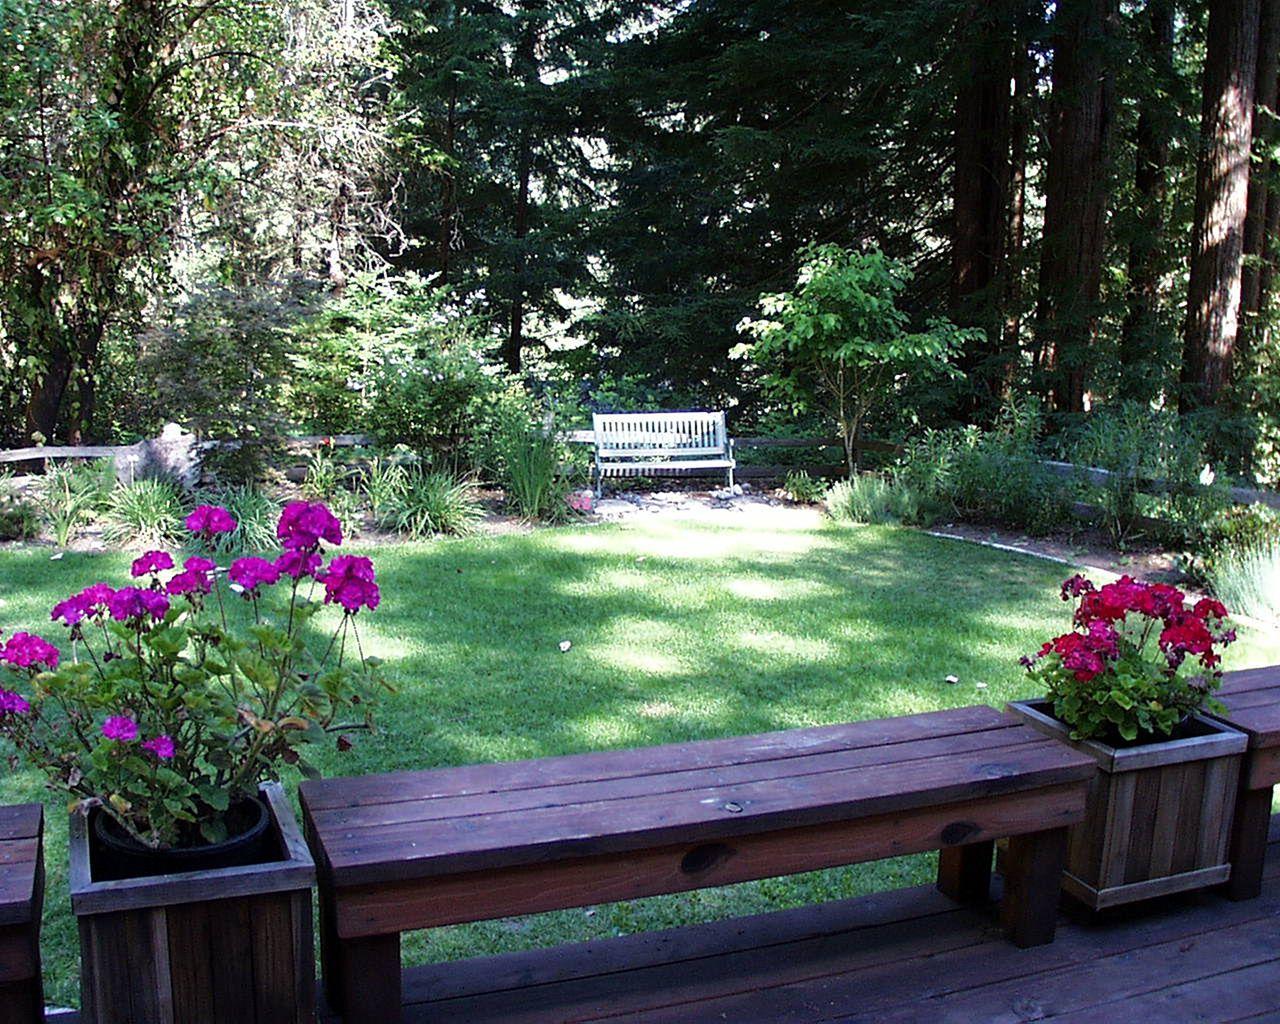 Best Back Yard Garden Designs (Best Back Yard Garden ... on Best Backyard Landscaping id=68036